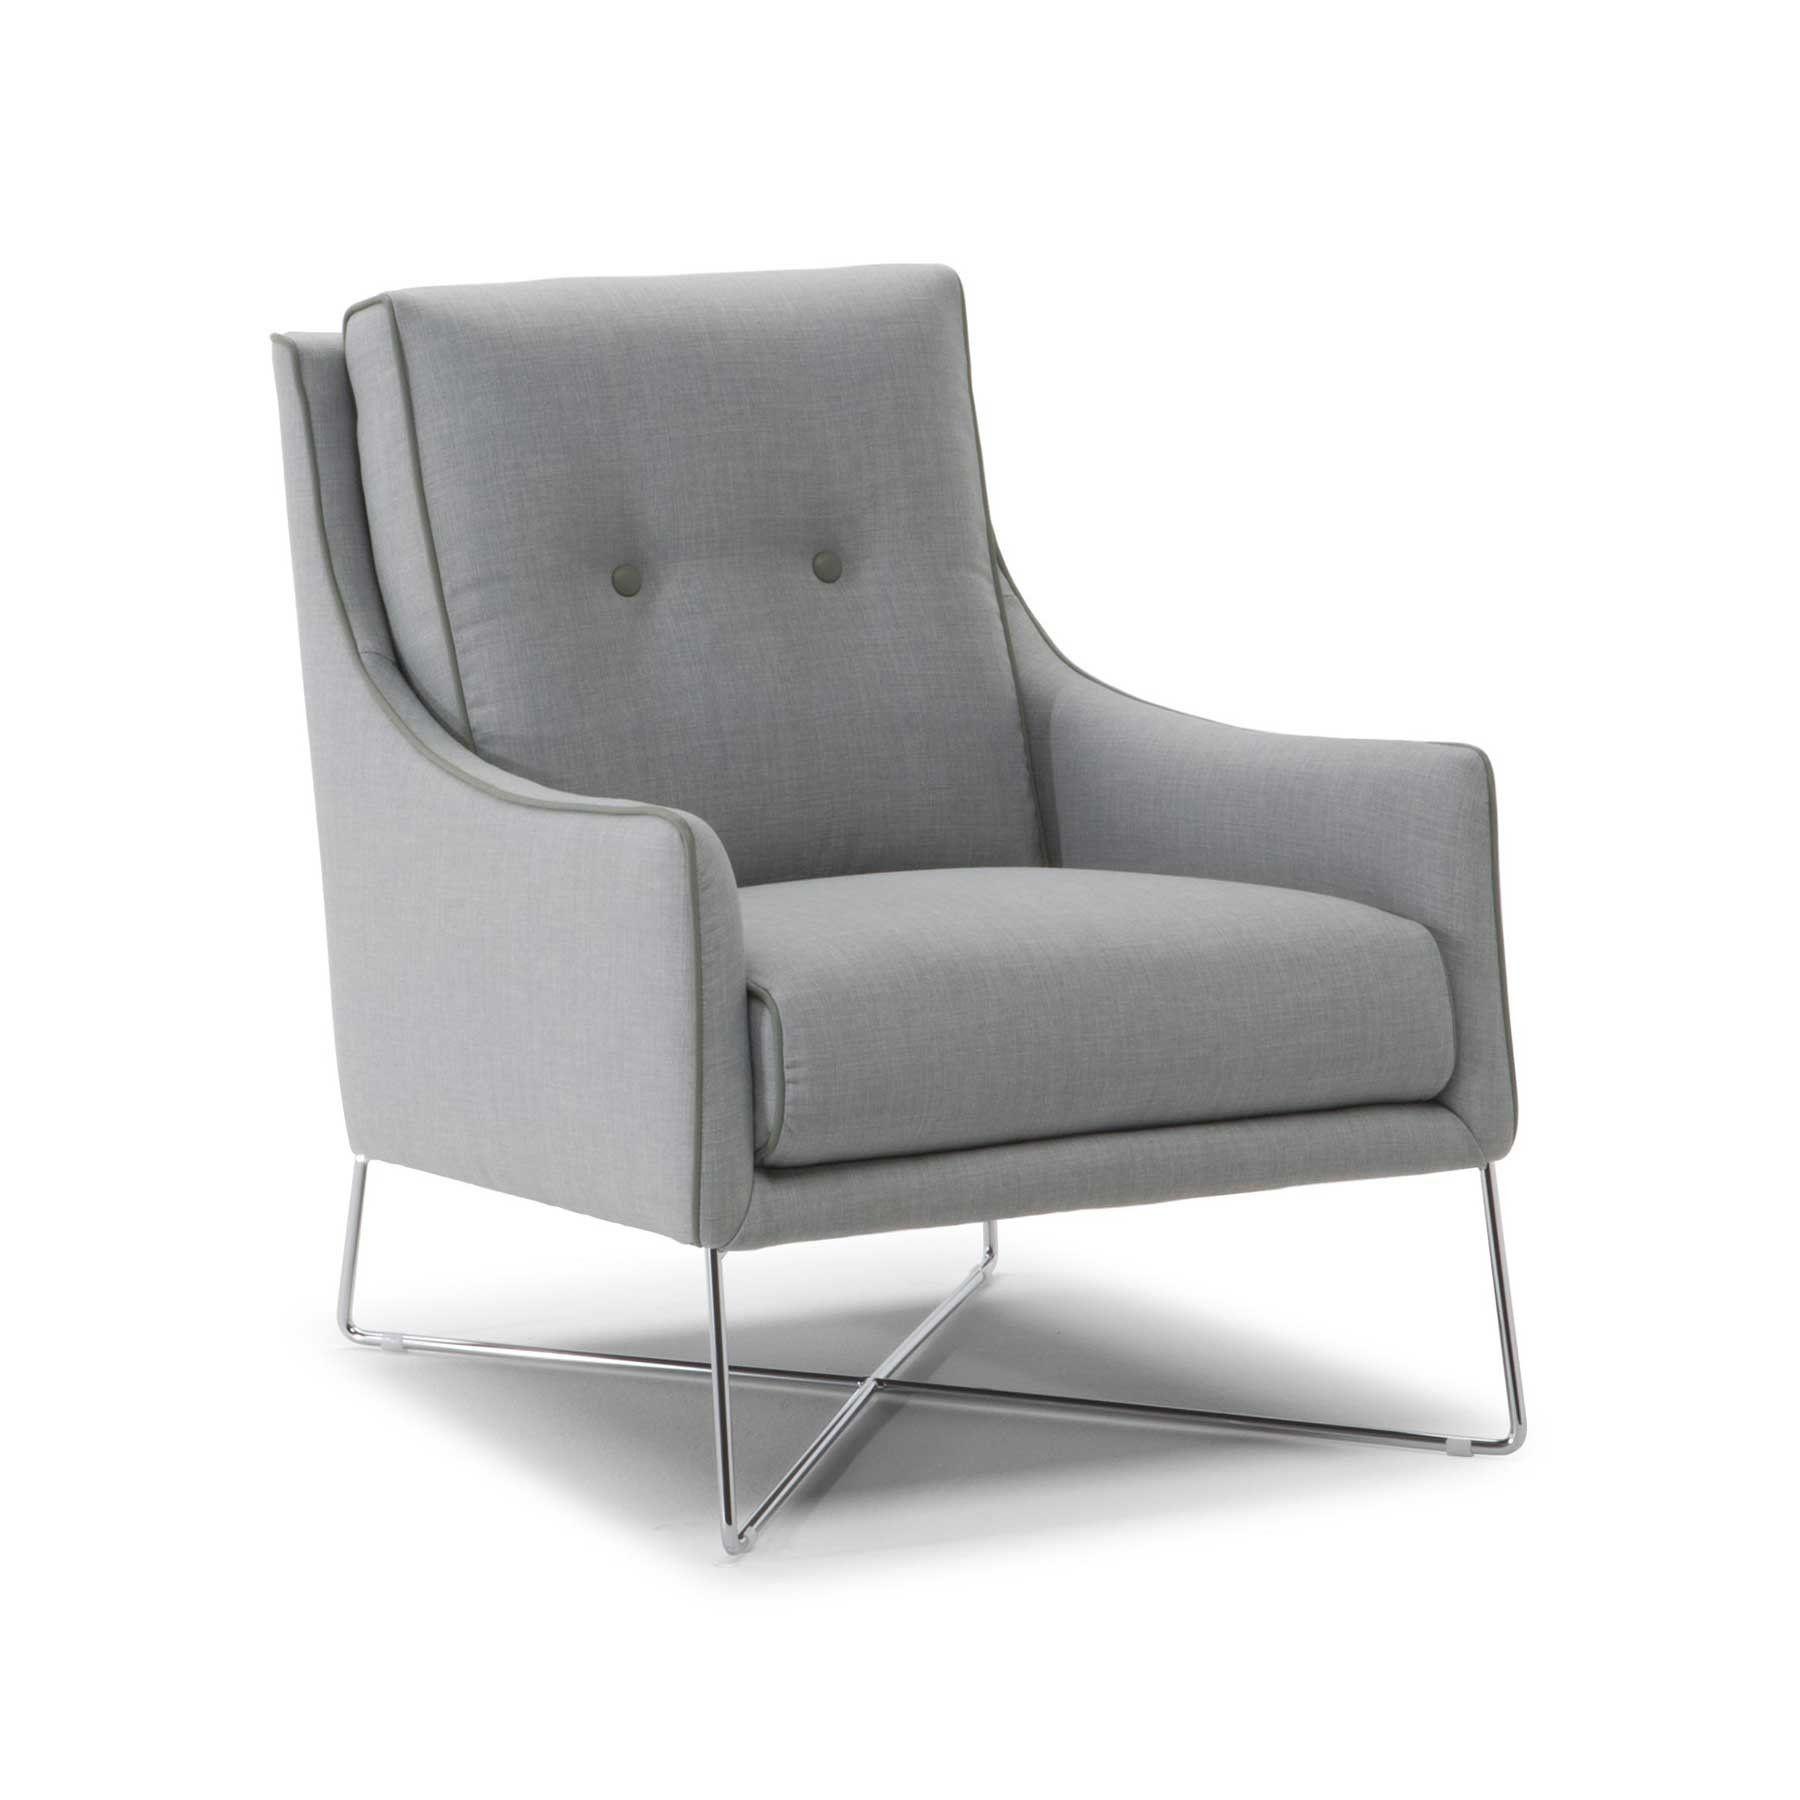 Natuzzi Editions Amicizia Armchair Armchair Furniture Home